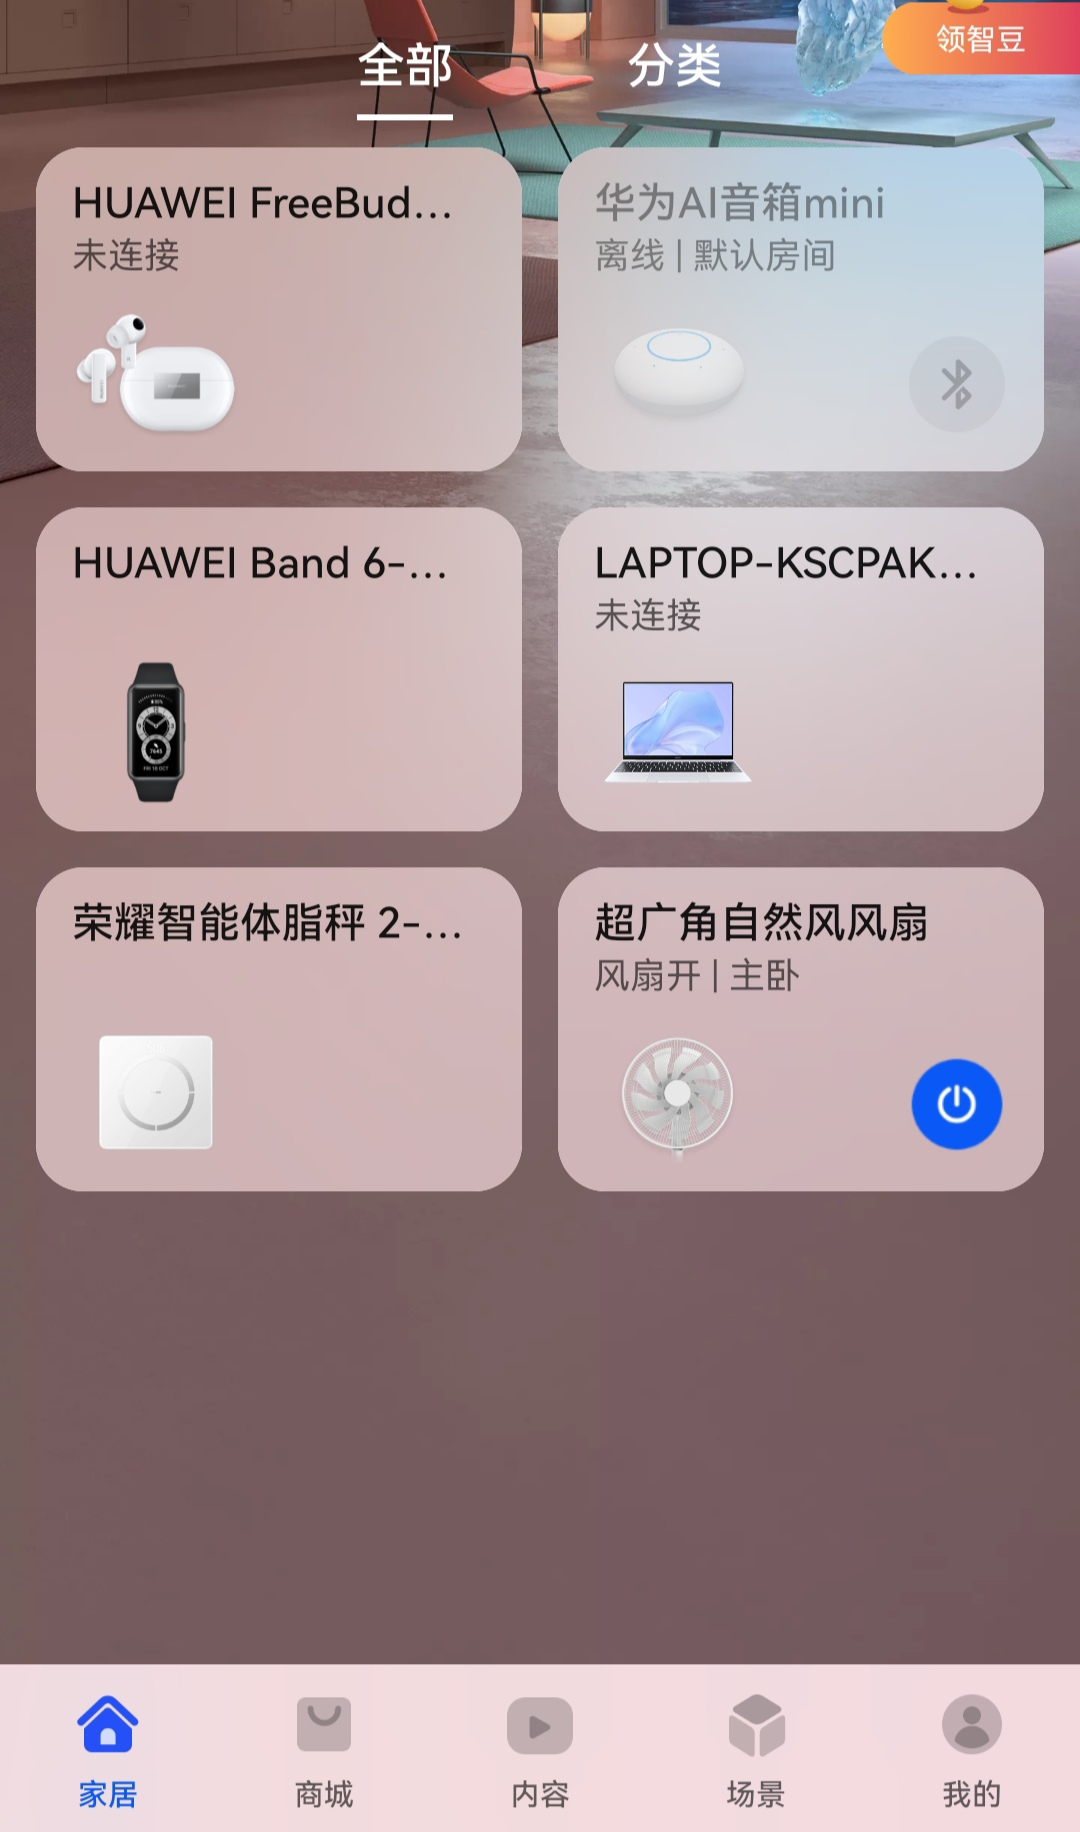 Screenshot_20210911_154452_com.huawei.smarthome_edit_104032080584507.jpg